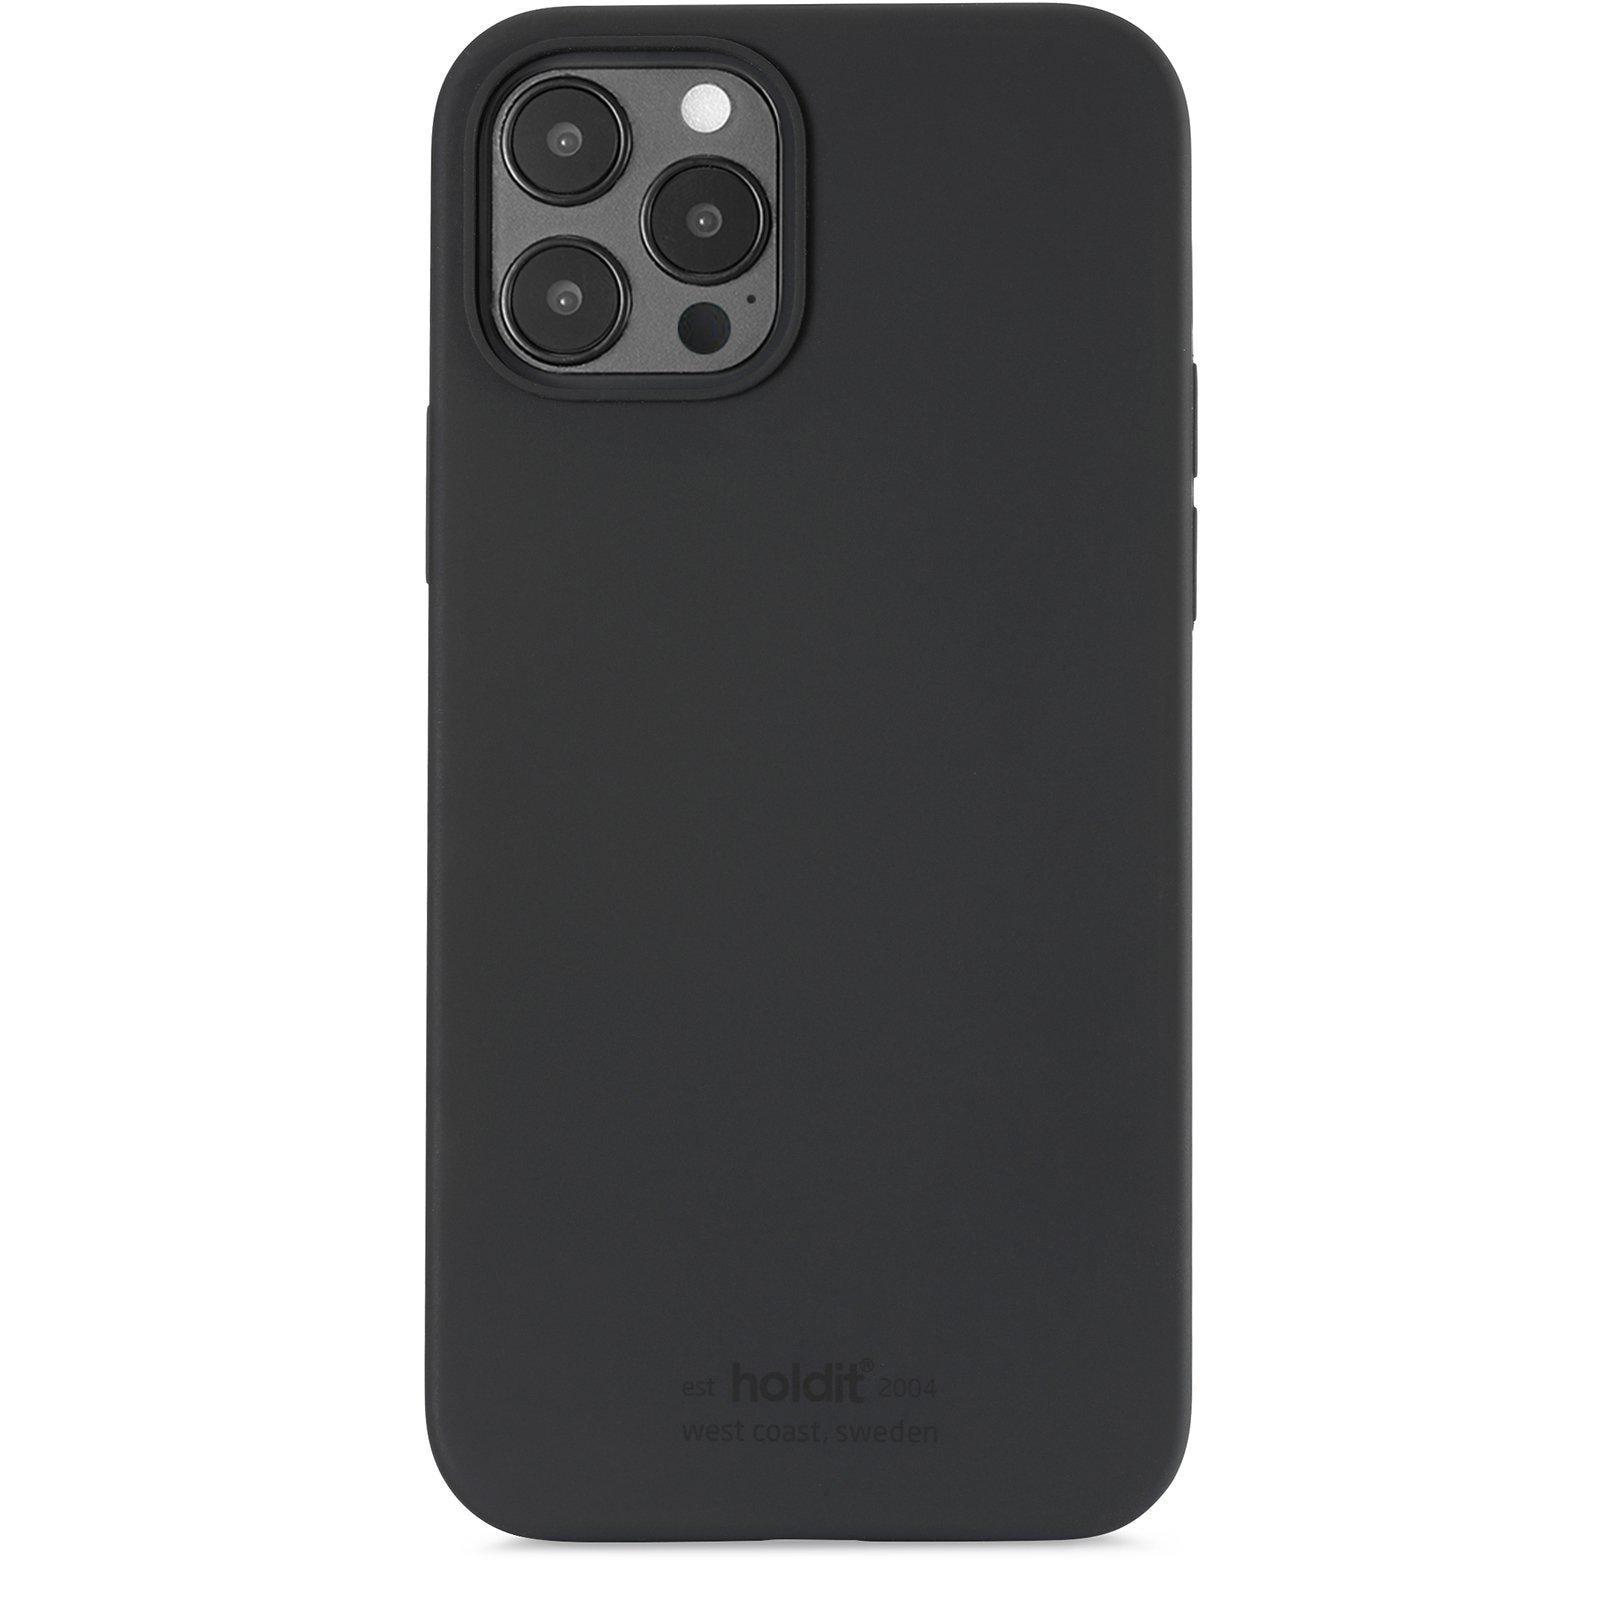 Silikonskal iPhone 12/12 Pro Black